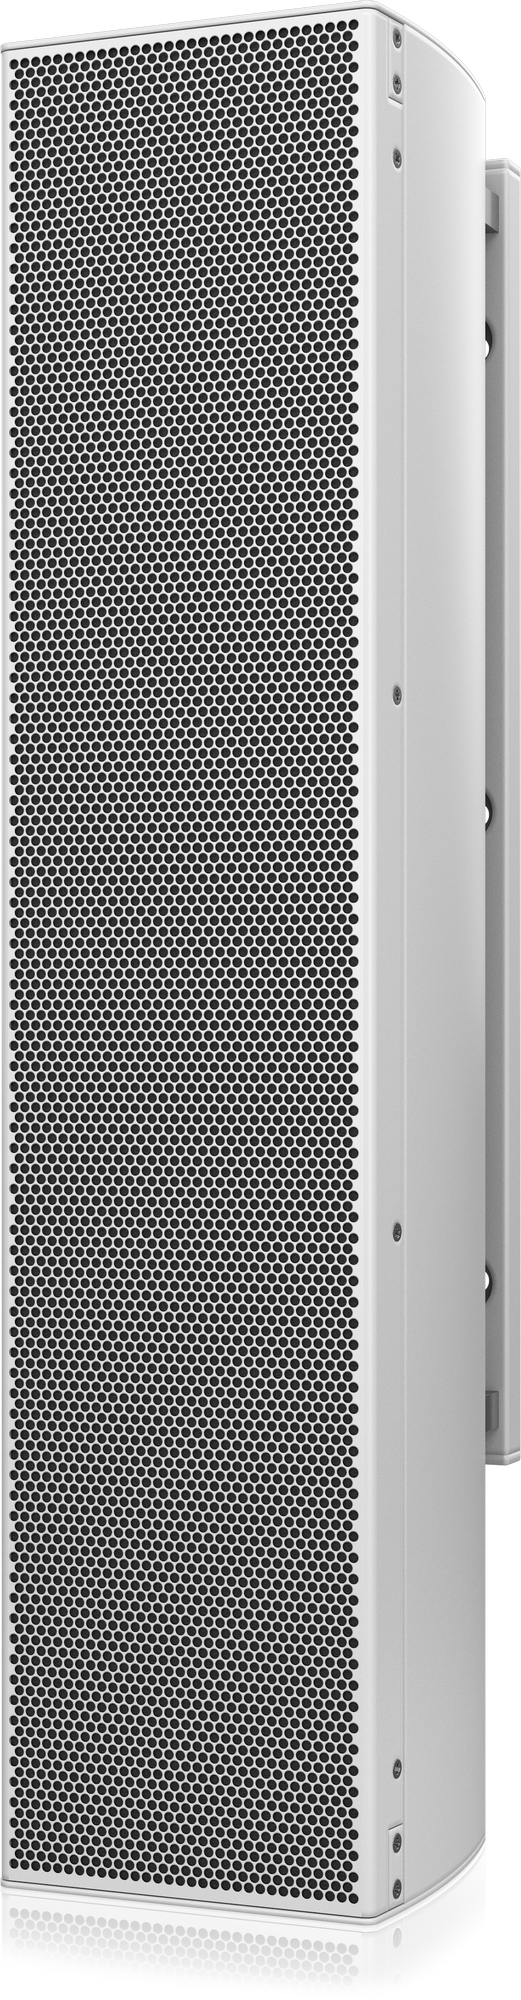 Tannoy  QFLEX 16 - Haut Parleur d'installation